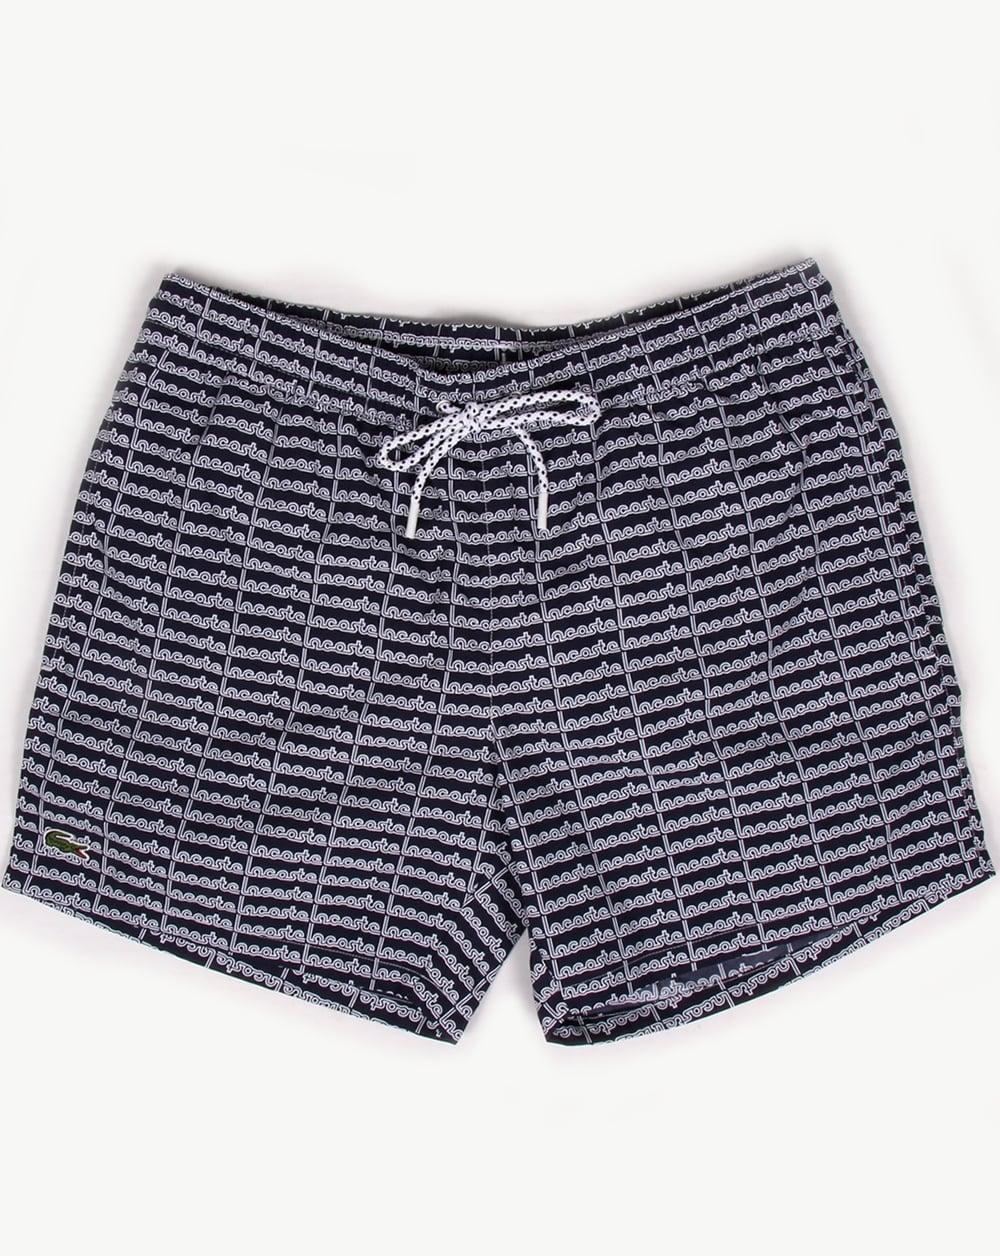 b92e2da5cc0ed Lacoste Linear Logo Swim Shorts Navy, Men's, Swimmers, Pool, Trunks